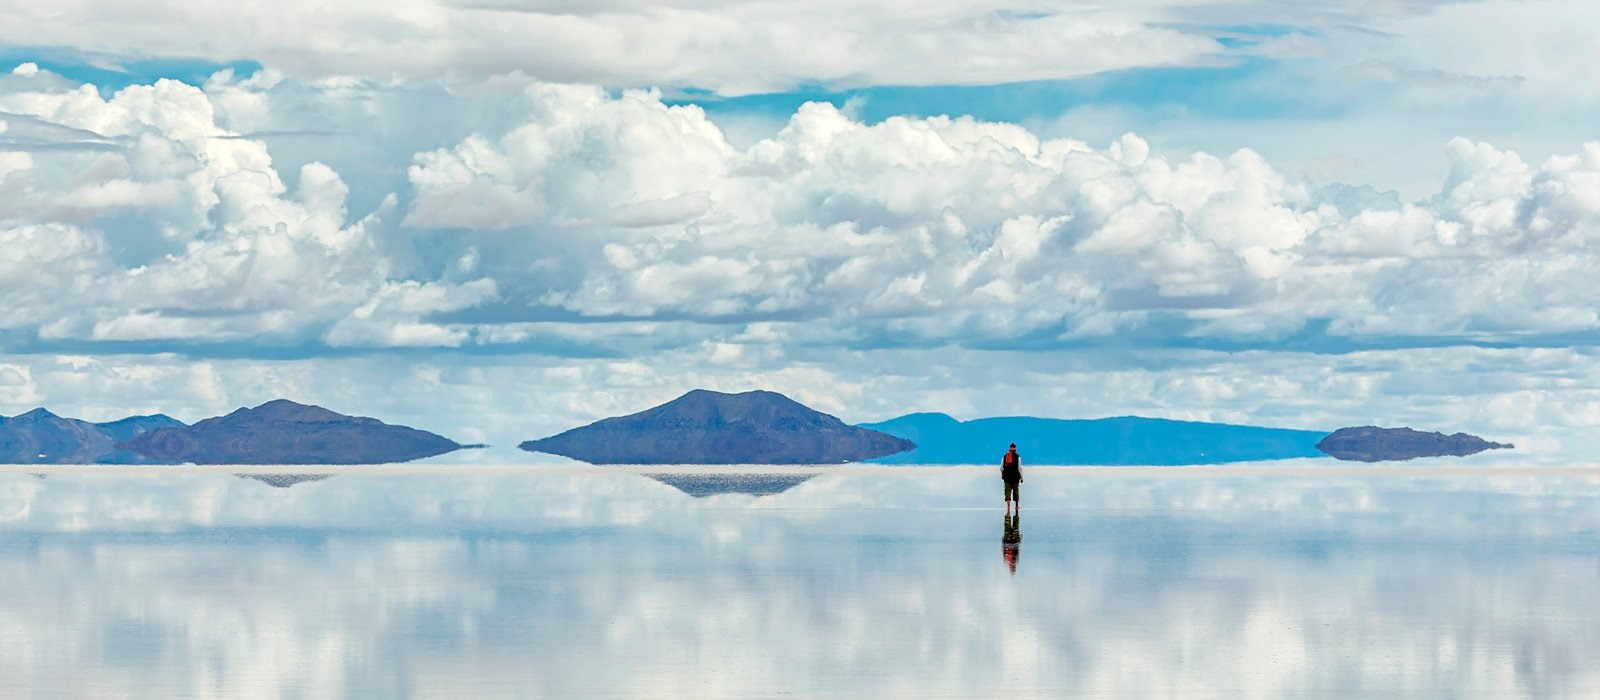 Salar de Uyuni and Atacama Desert